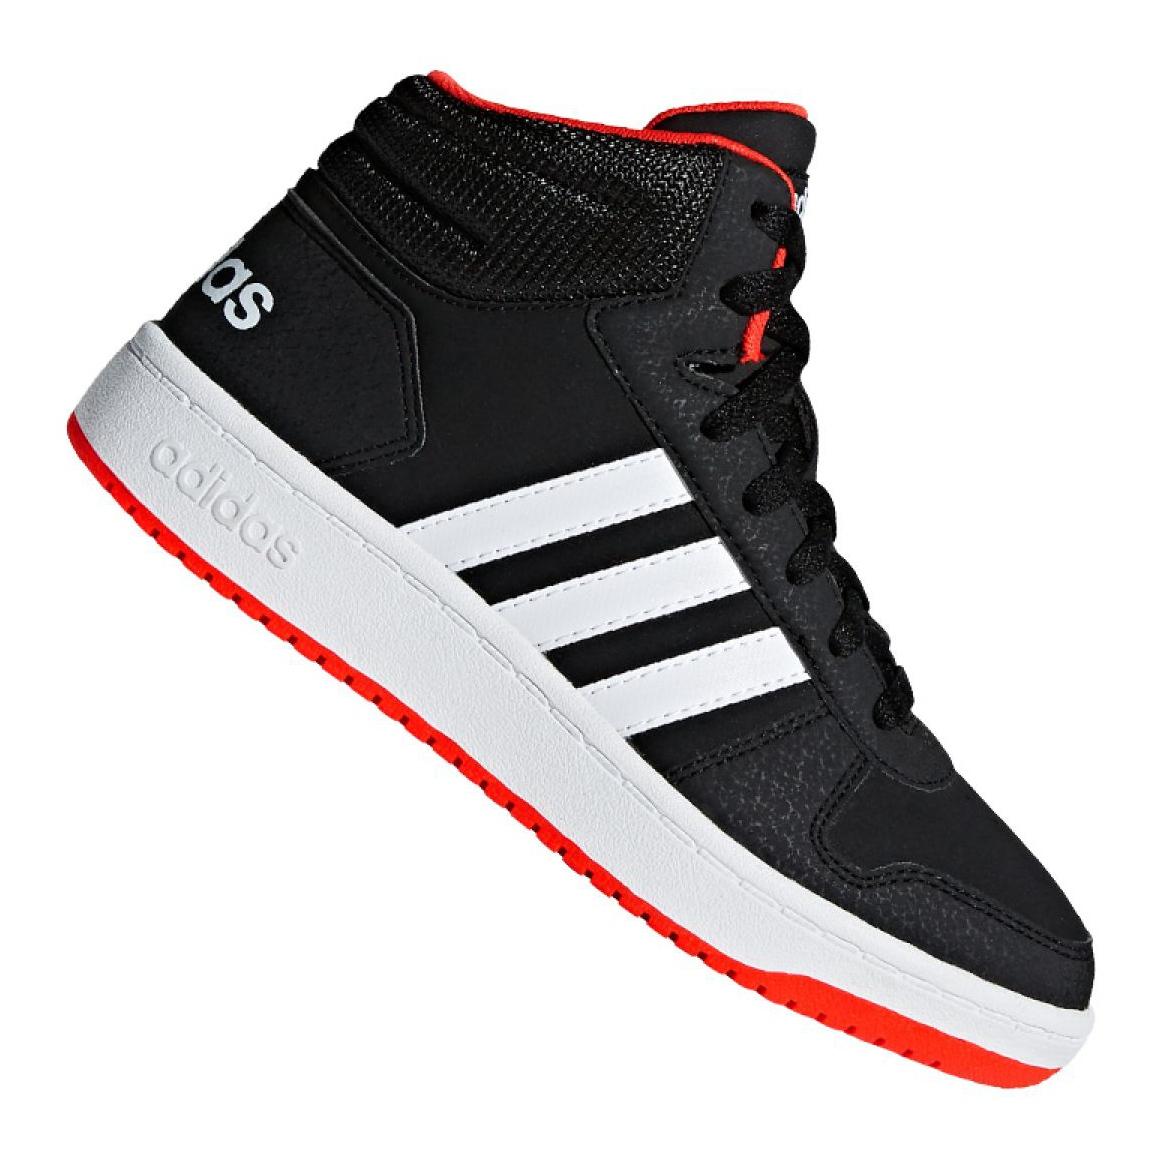 Fiú ADIDAS HOOPS MID 2.0 sneaker fekete színben | adidas